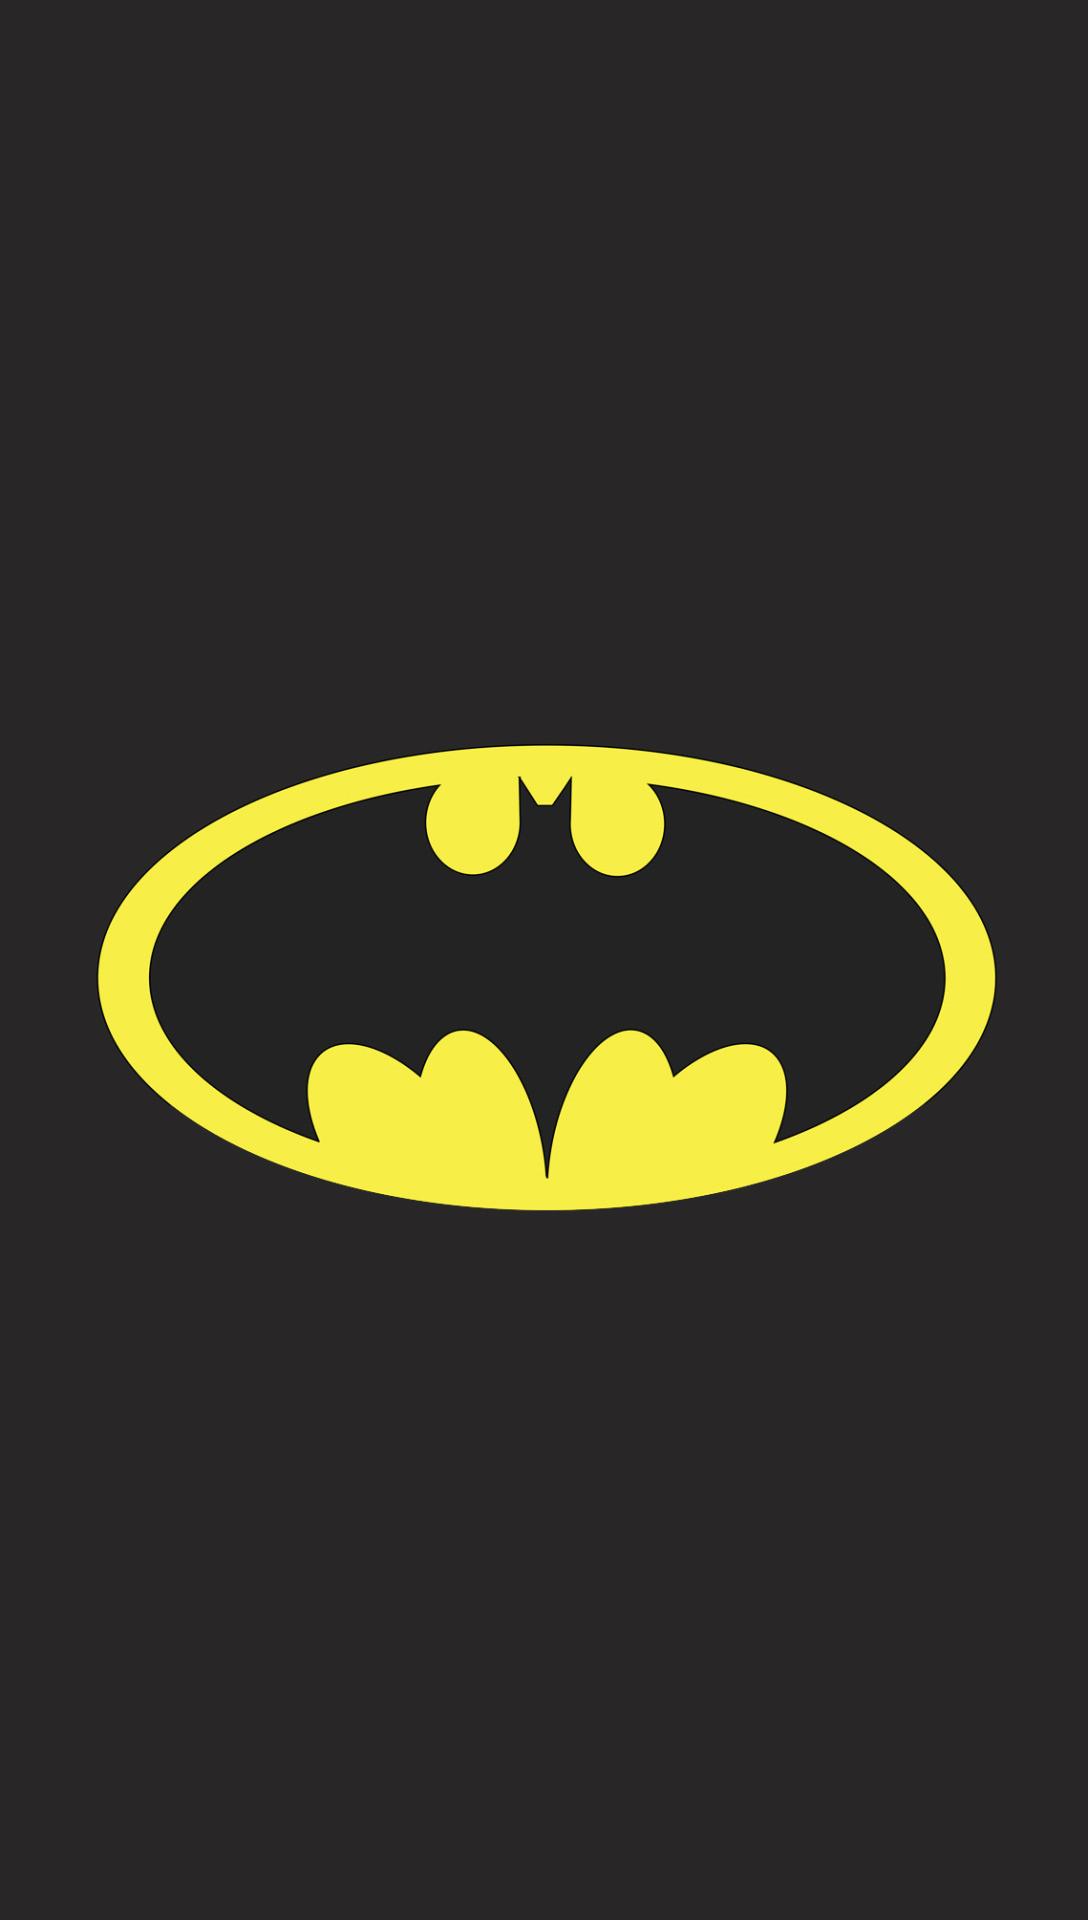 Best Car Logos Wallpaper Batman Lock Screen Wallpaper 63 Images